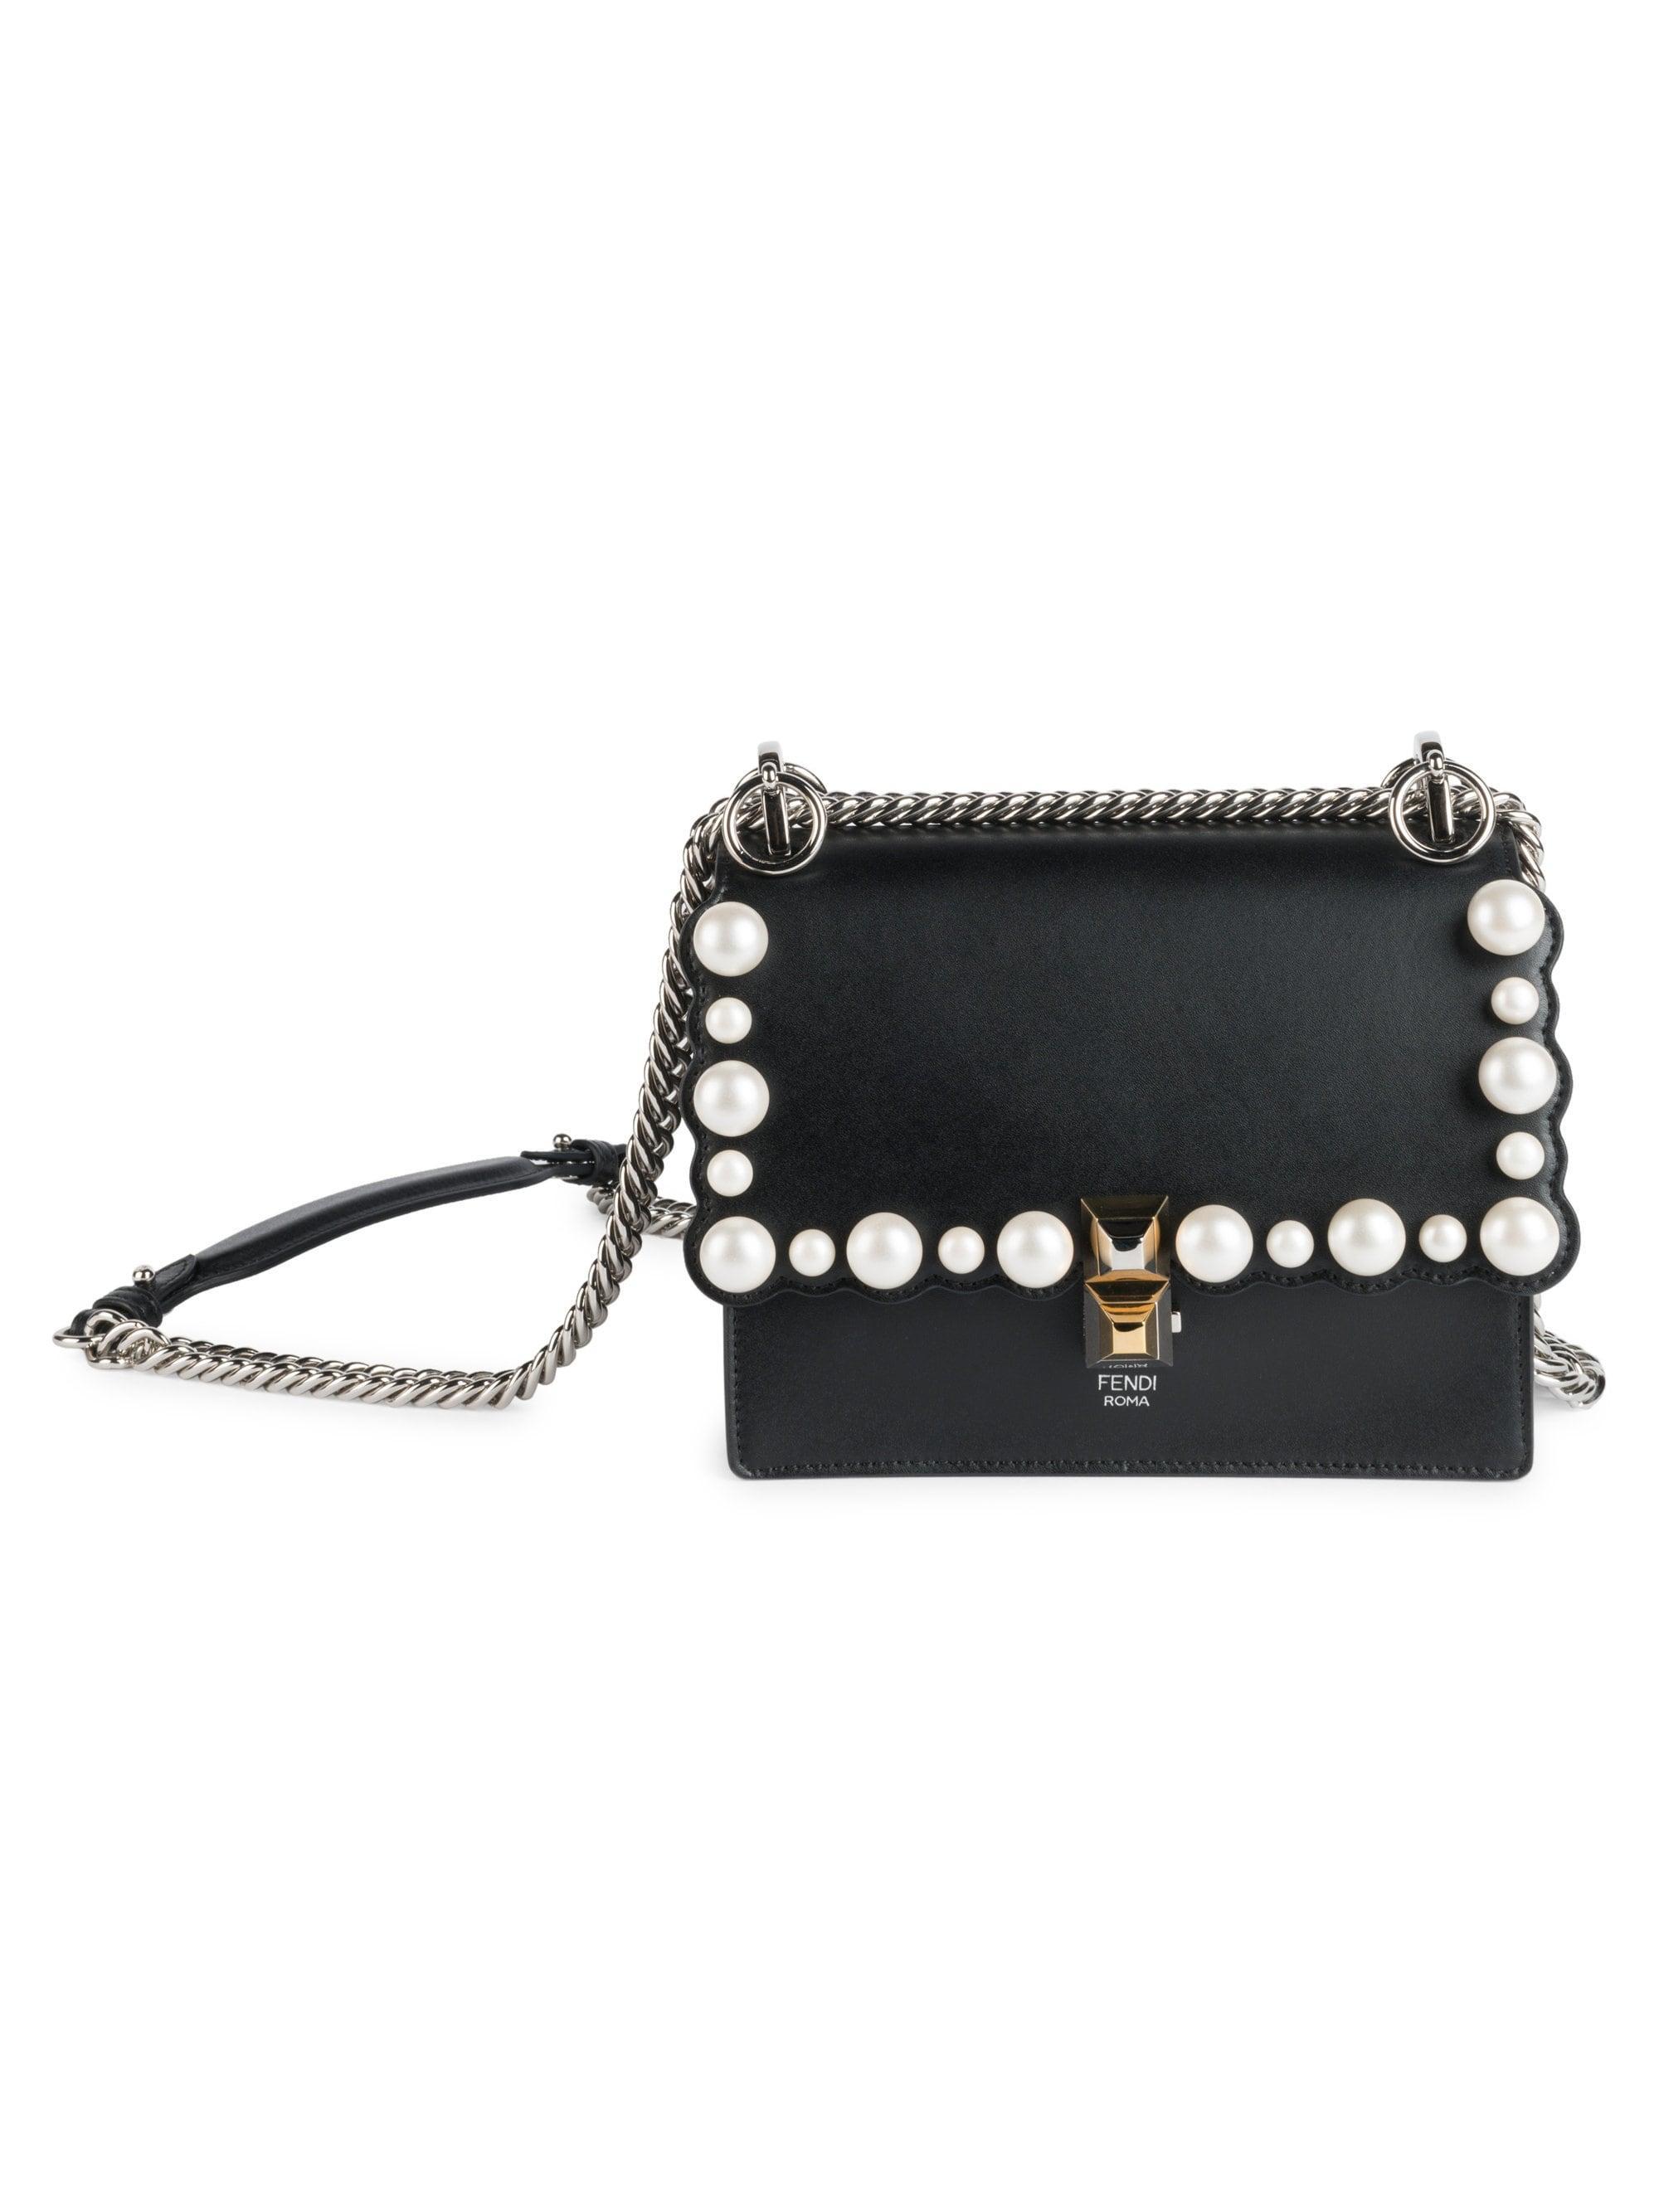 f1225be26347 Lyst - Fendi Women s Kan I Small Crossbody Bag - Black in Black ...